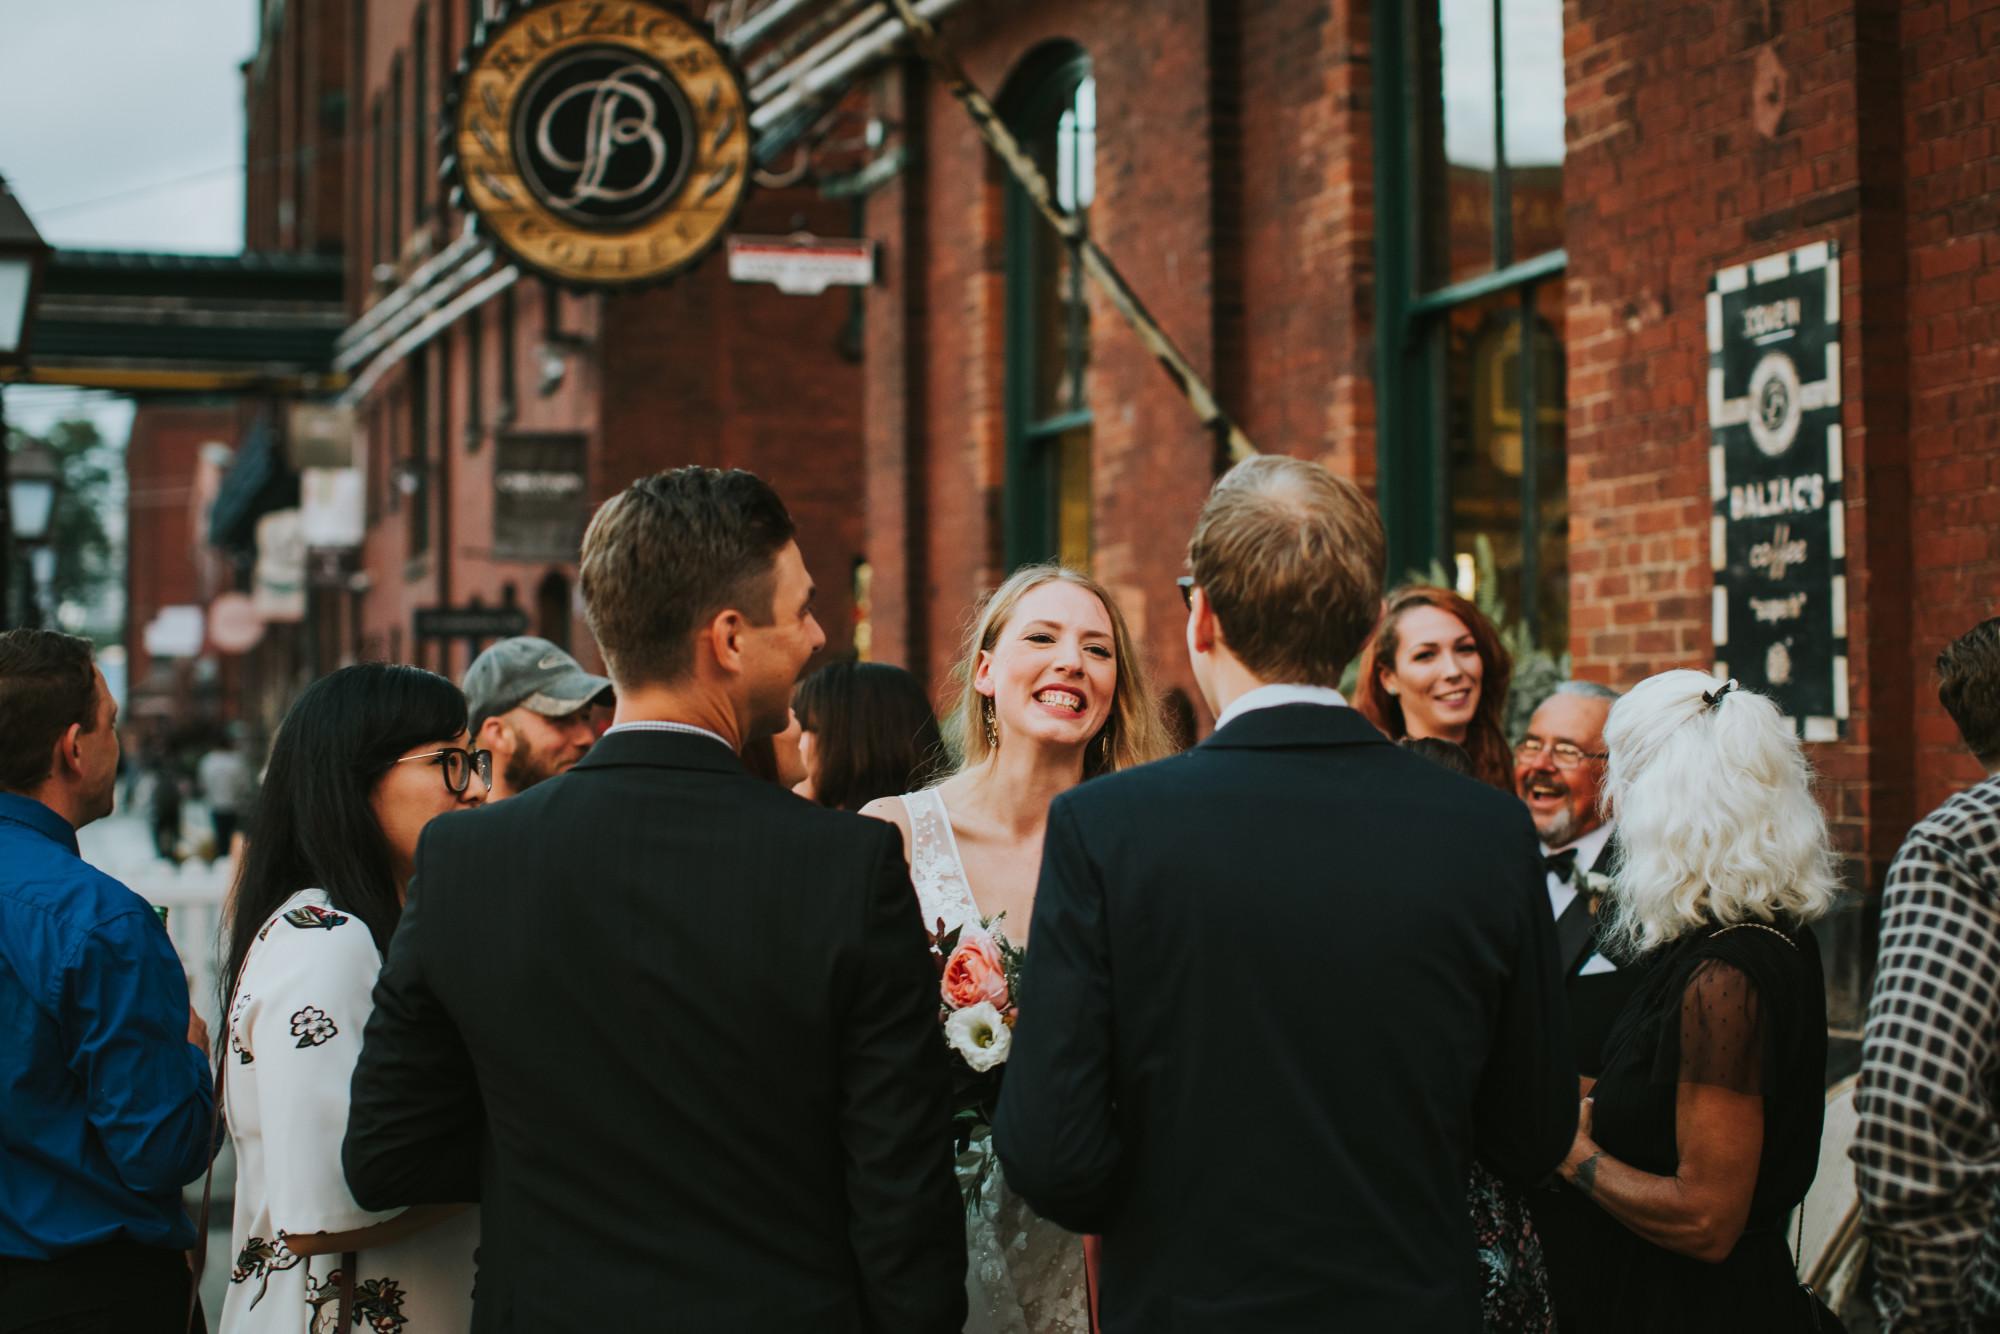 Beth-Ted-Balzacs-Coffee-Distillery-District-Toronto-Wedding-Planning-INLY-Events-Lushana-Bale-Photography-0218.jpg